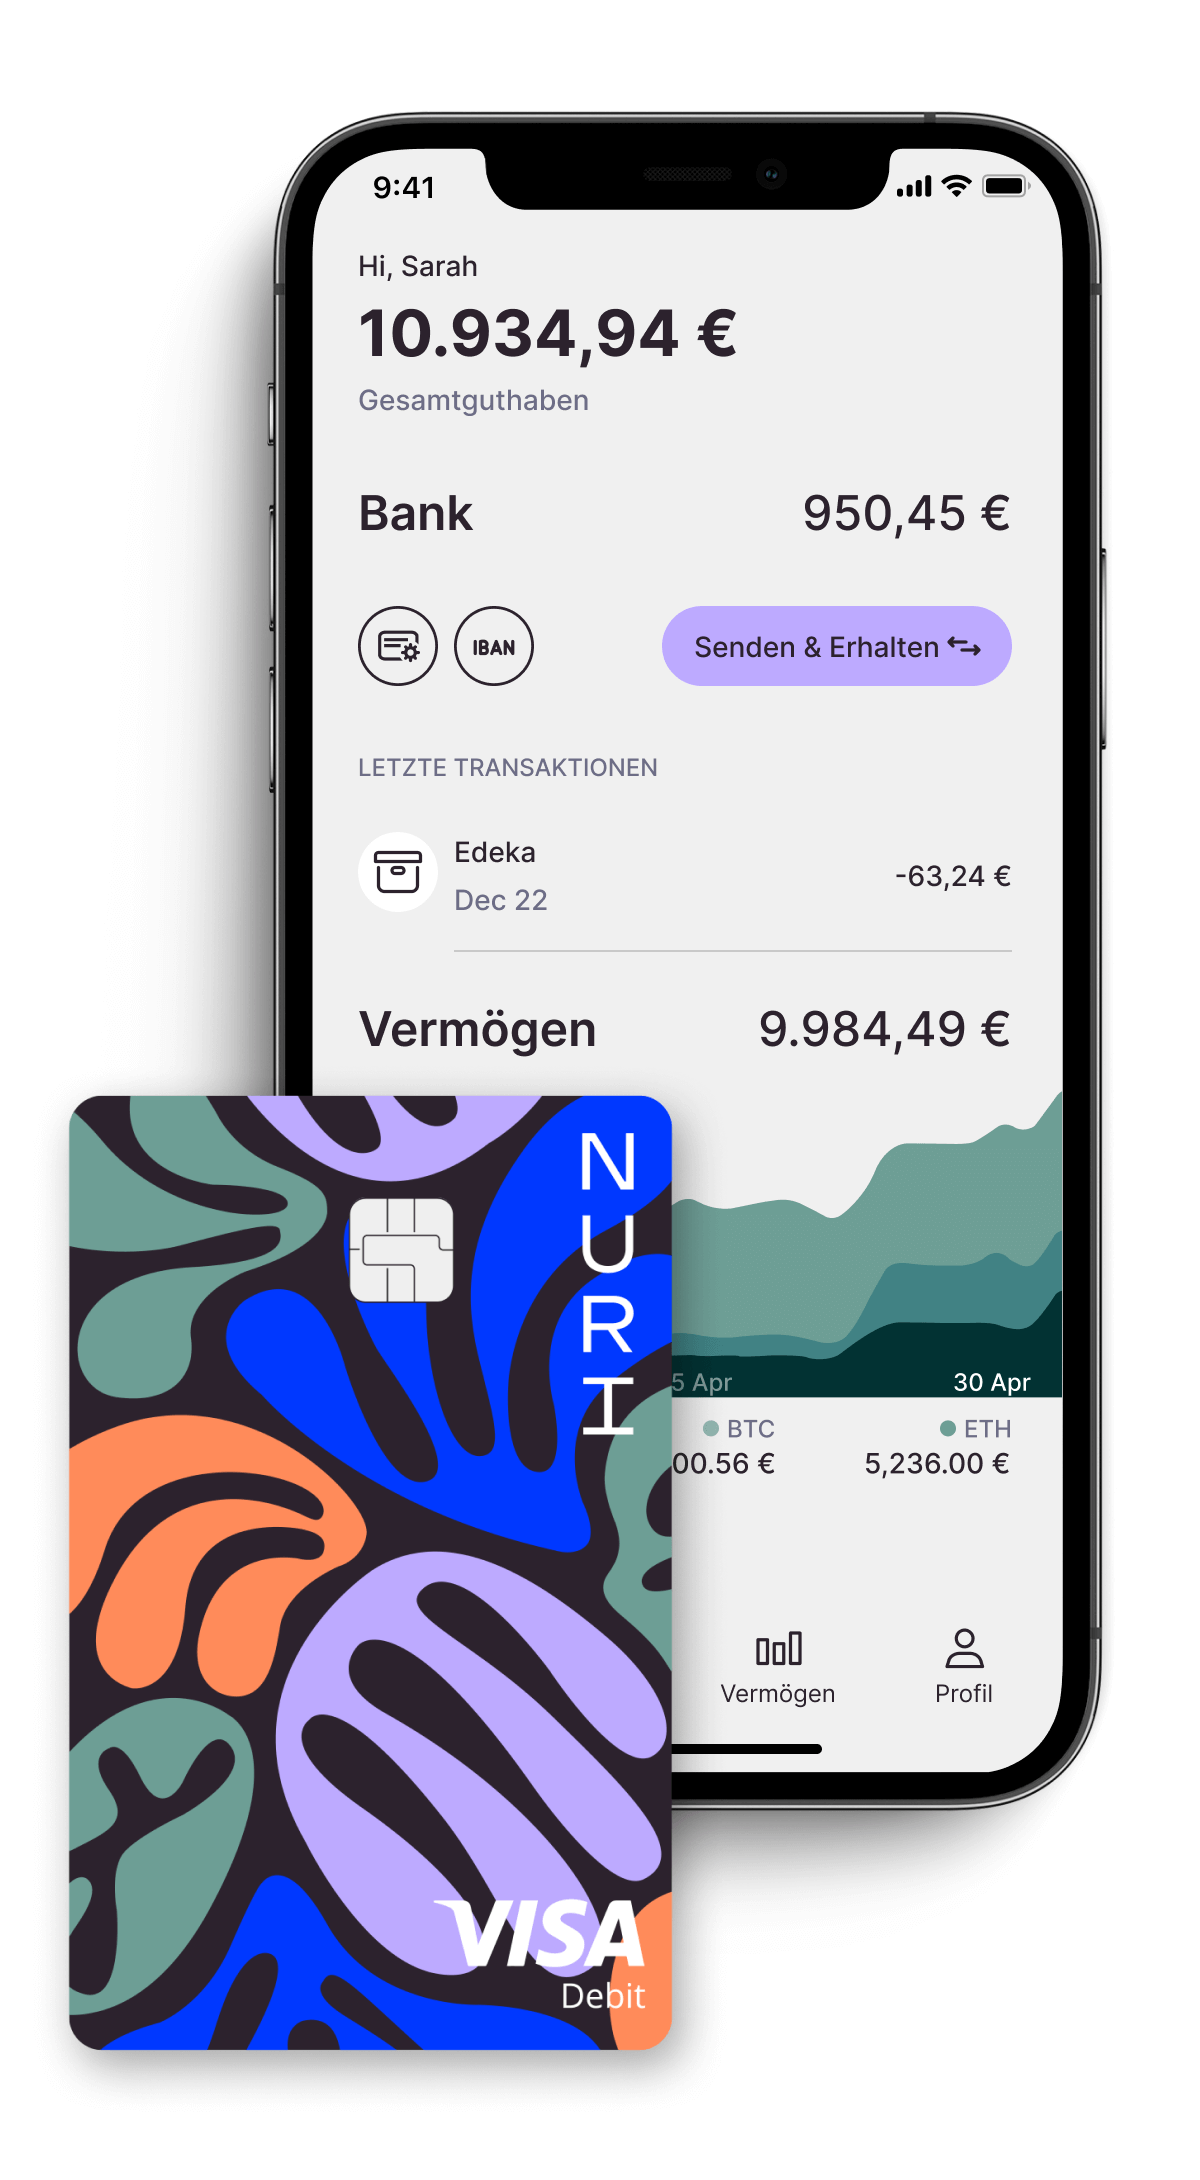 Nuri Smartphone-Konto?bersicht und VISA-Kreditkarte